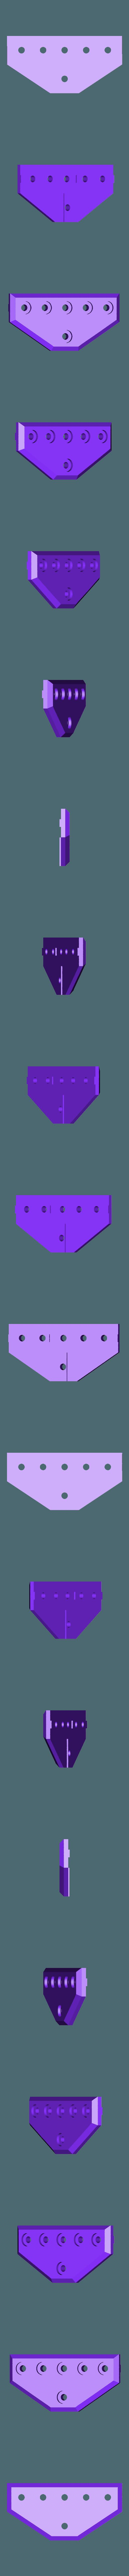 2020_Delta_Plate_6Screw_V2.stl Download free STL file 2020 Profile Aluminum 3D Printable Erector Set • 3D printer model, adamjvr